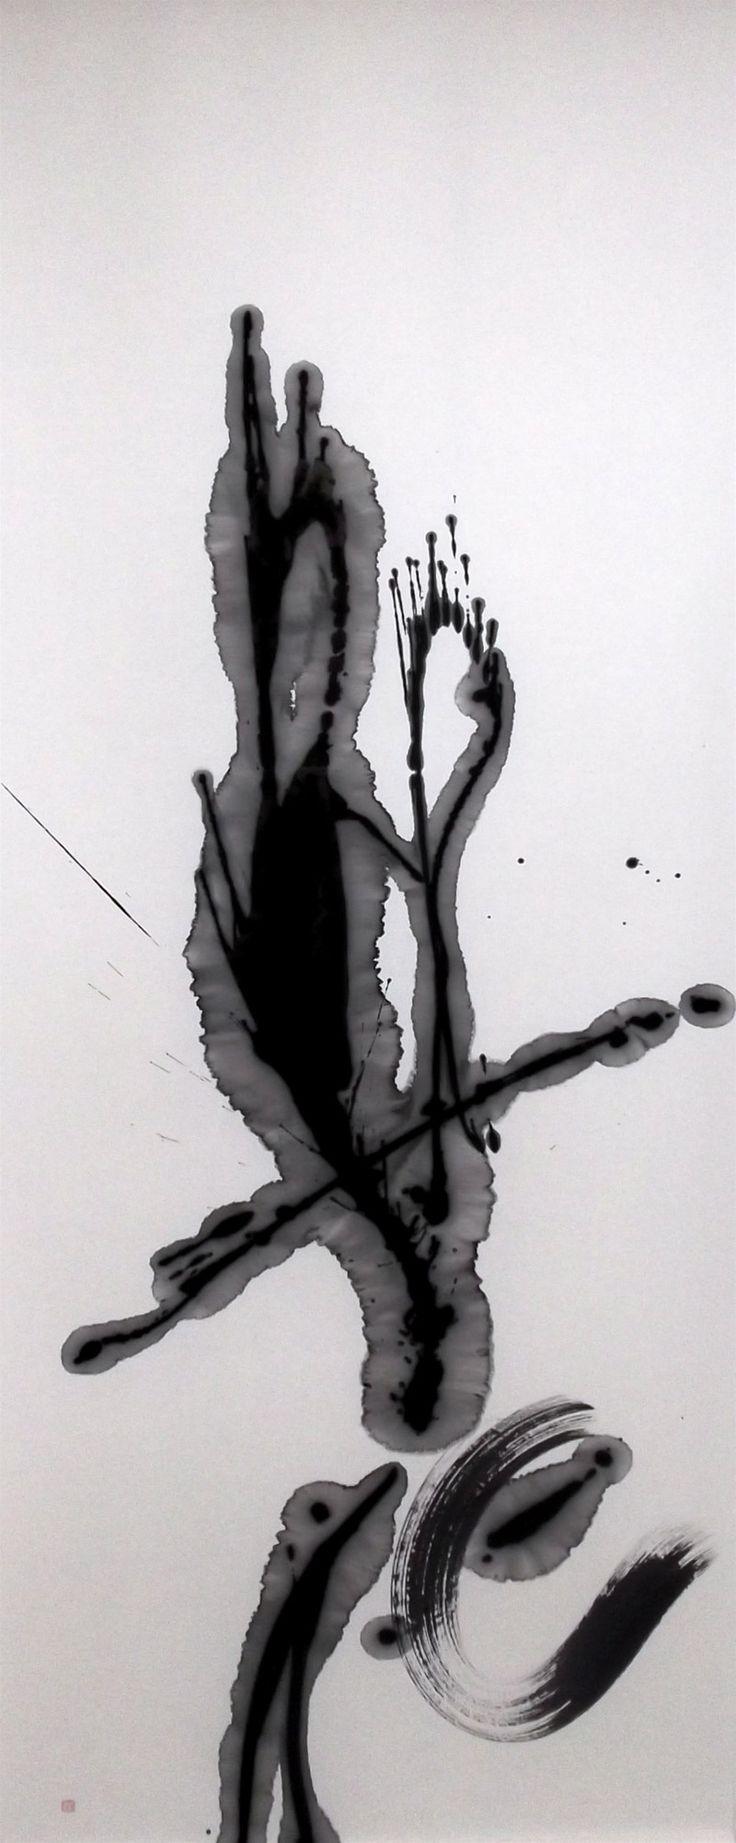 "Calligraphy by 花 ""flower"" by Hiroyuki NAKAJIMA, Japan 中嶋宏行"